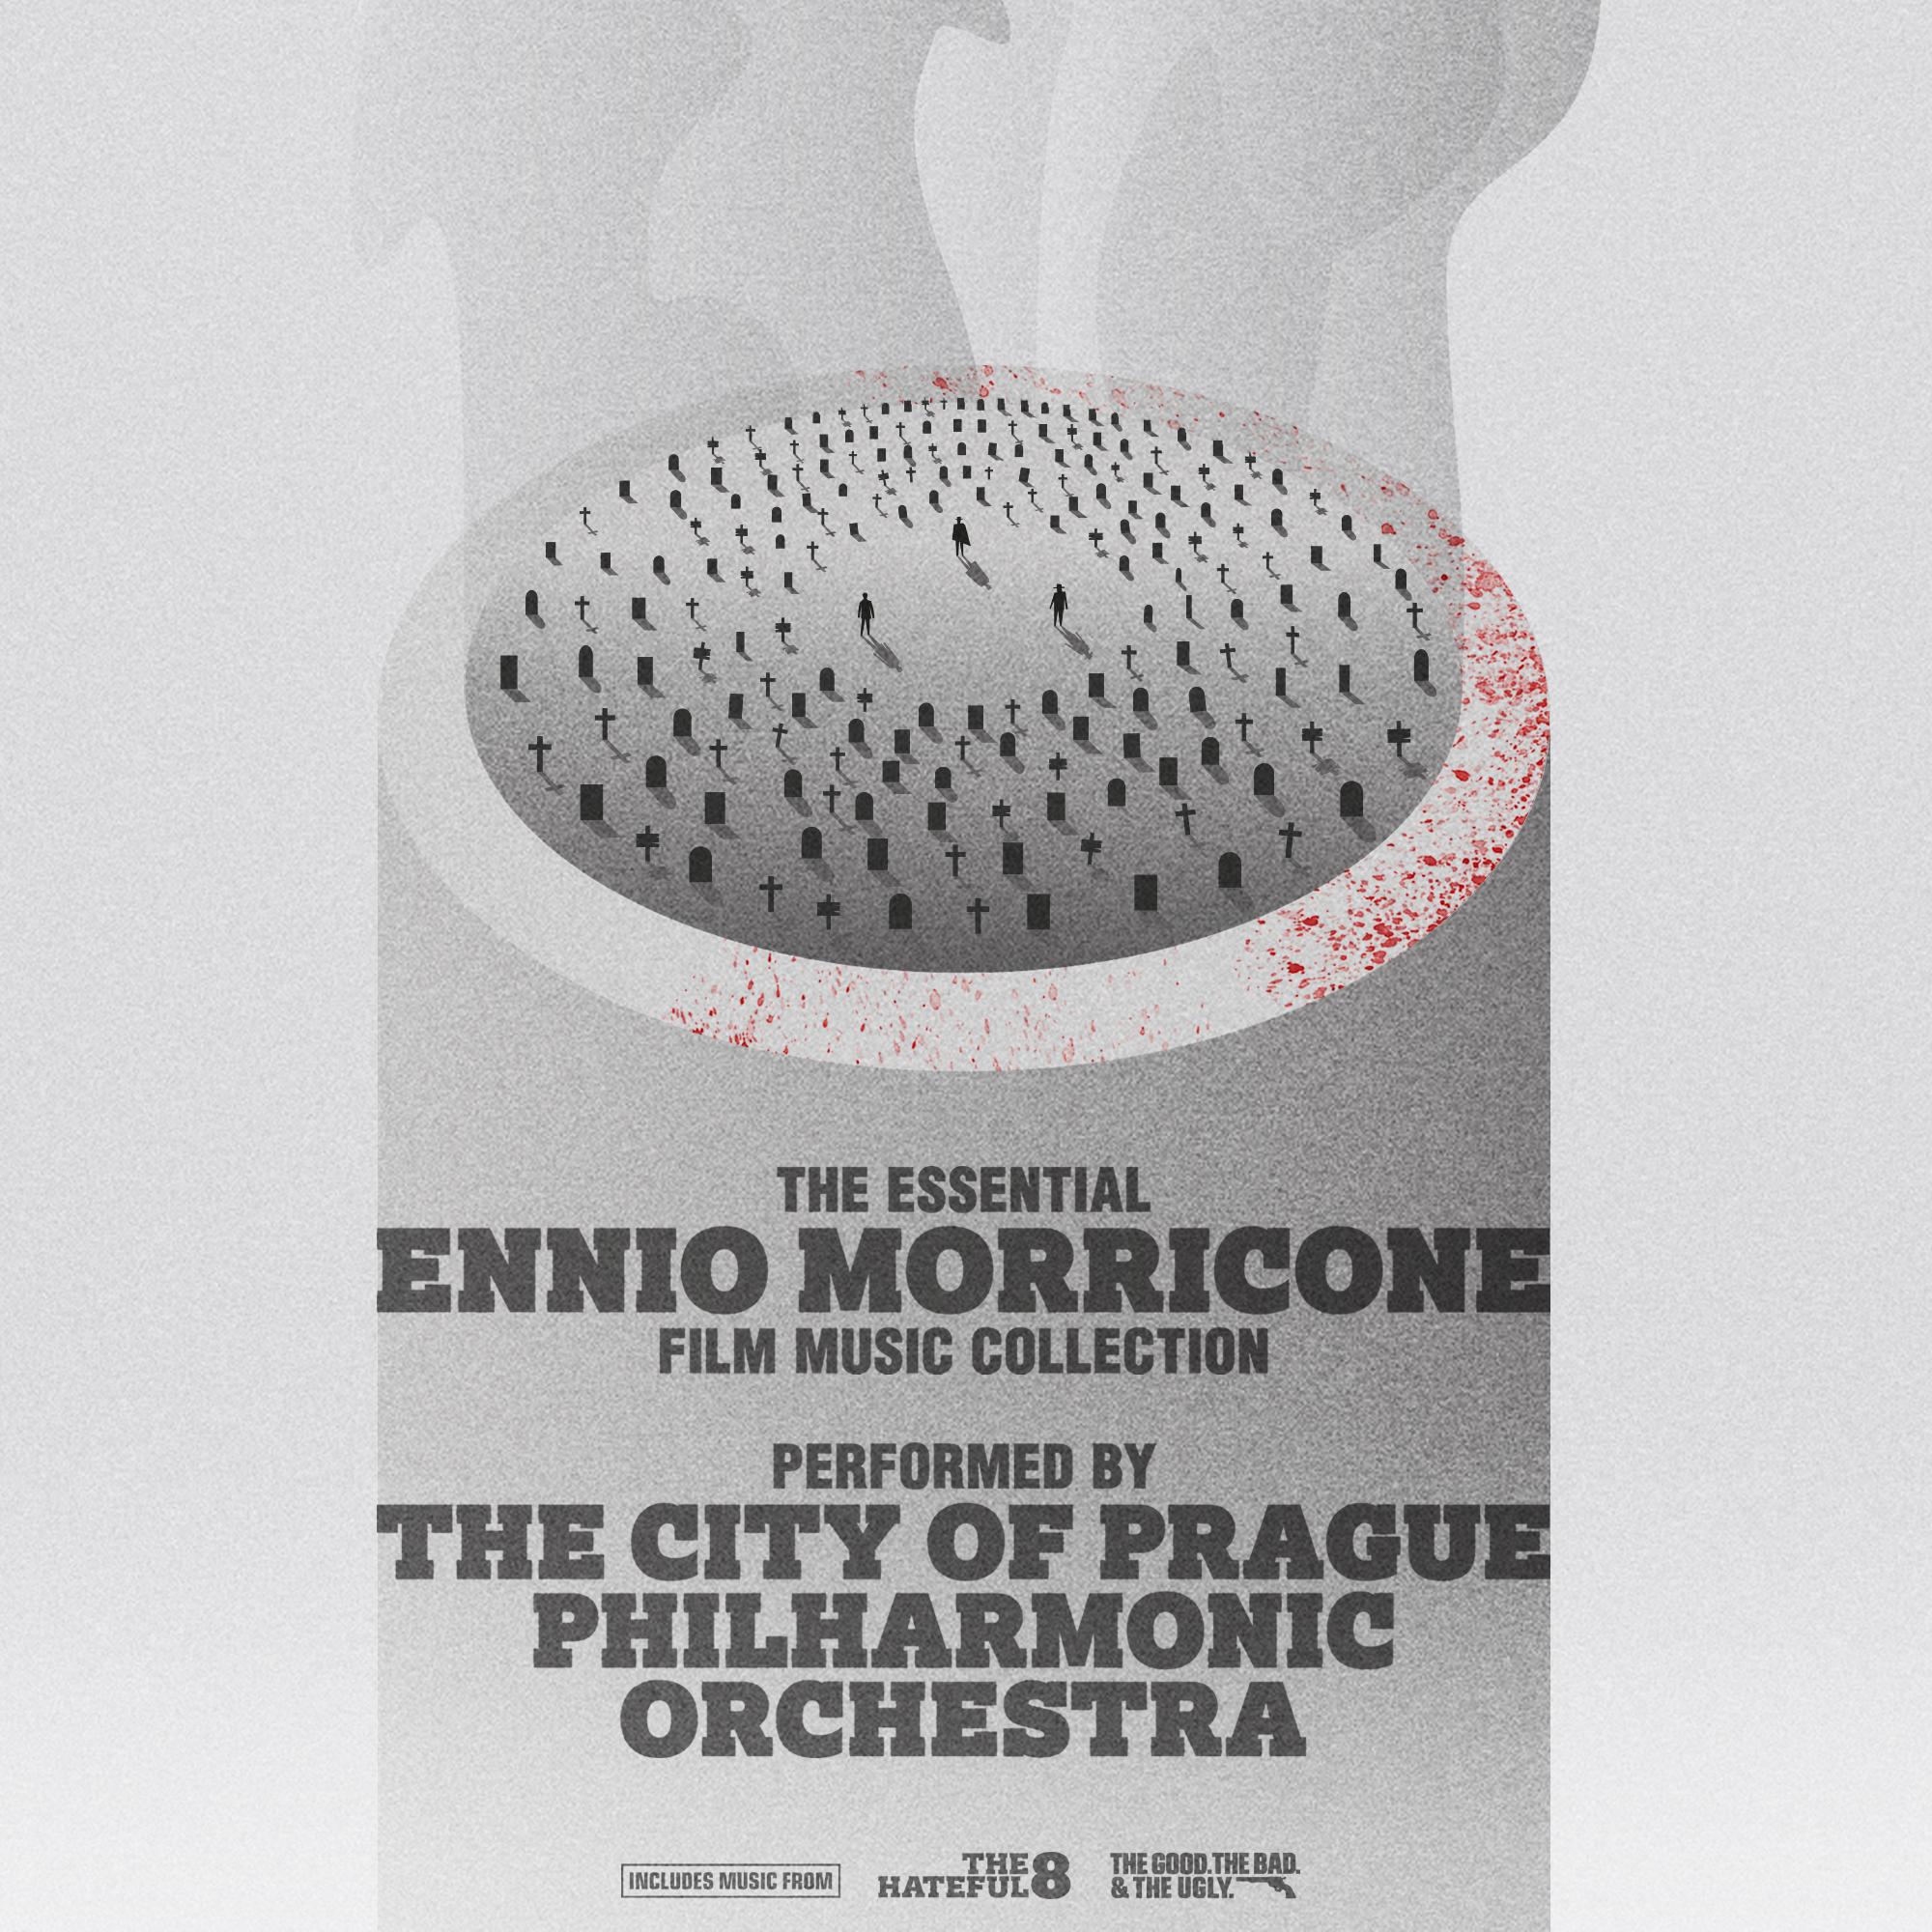 The Essential Ennio Morricone Film Music Collection